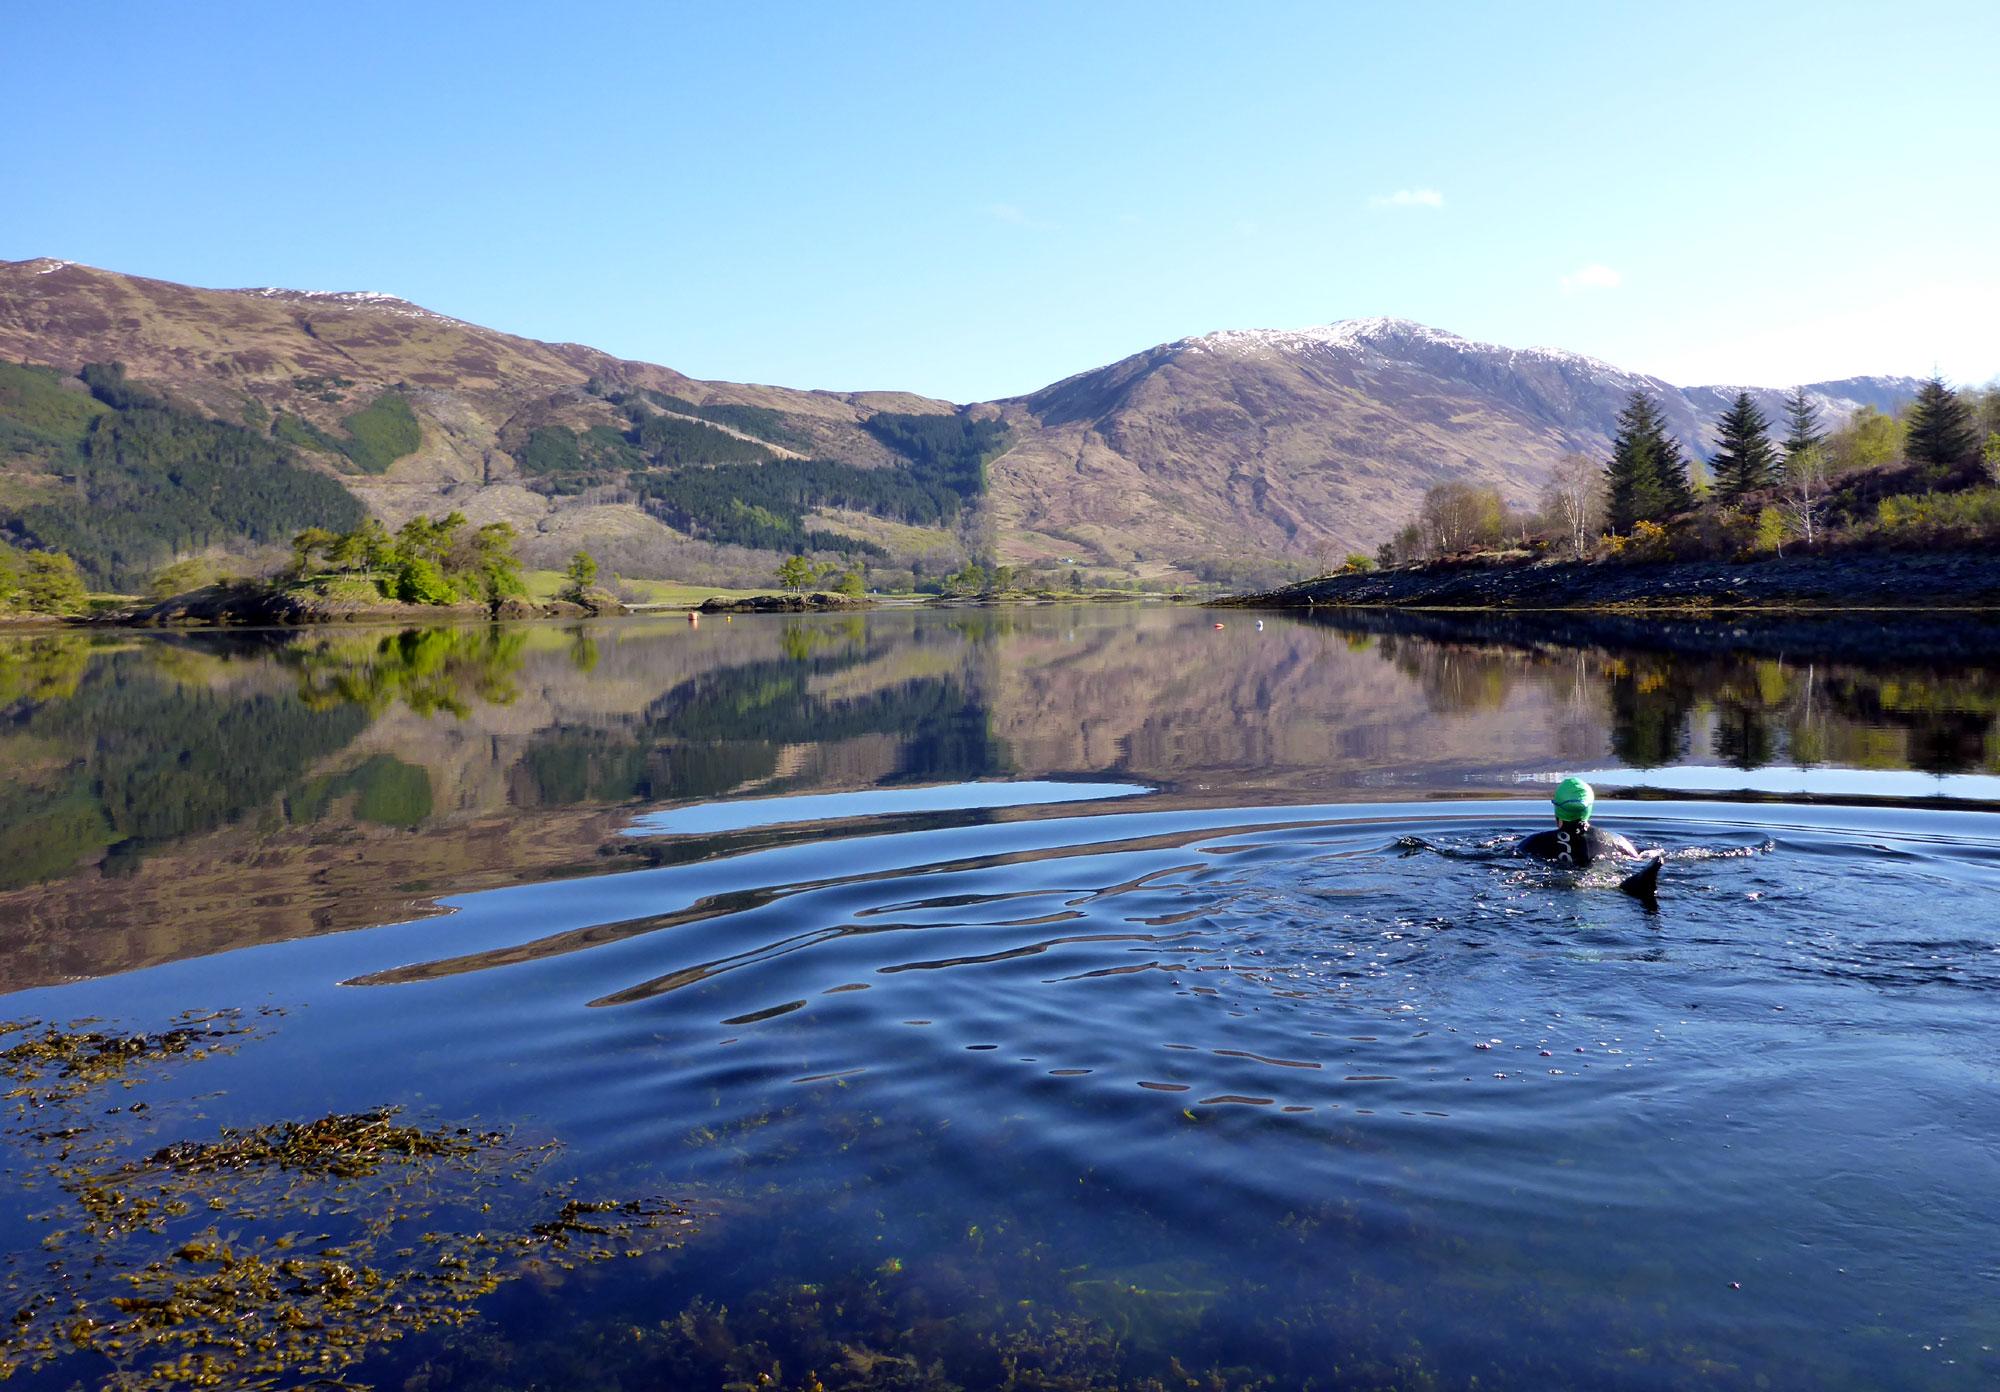 Bobbing about in Loch Leven